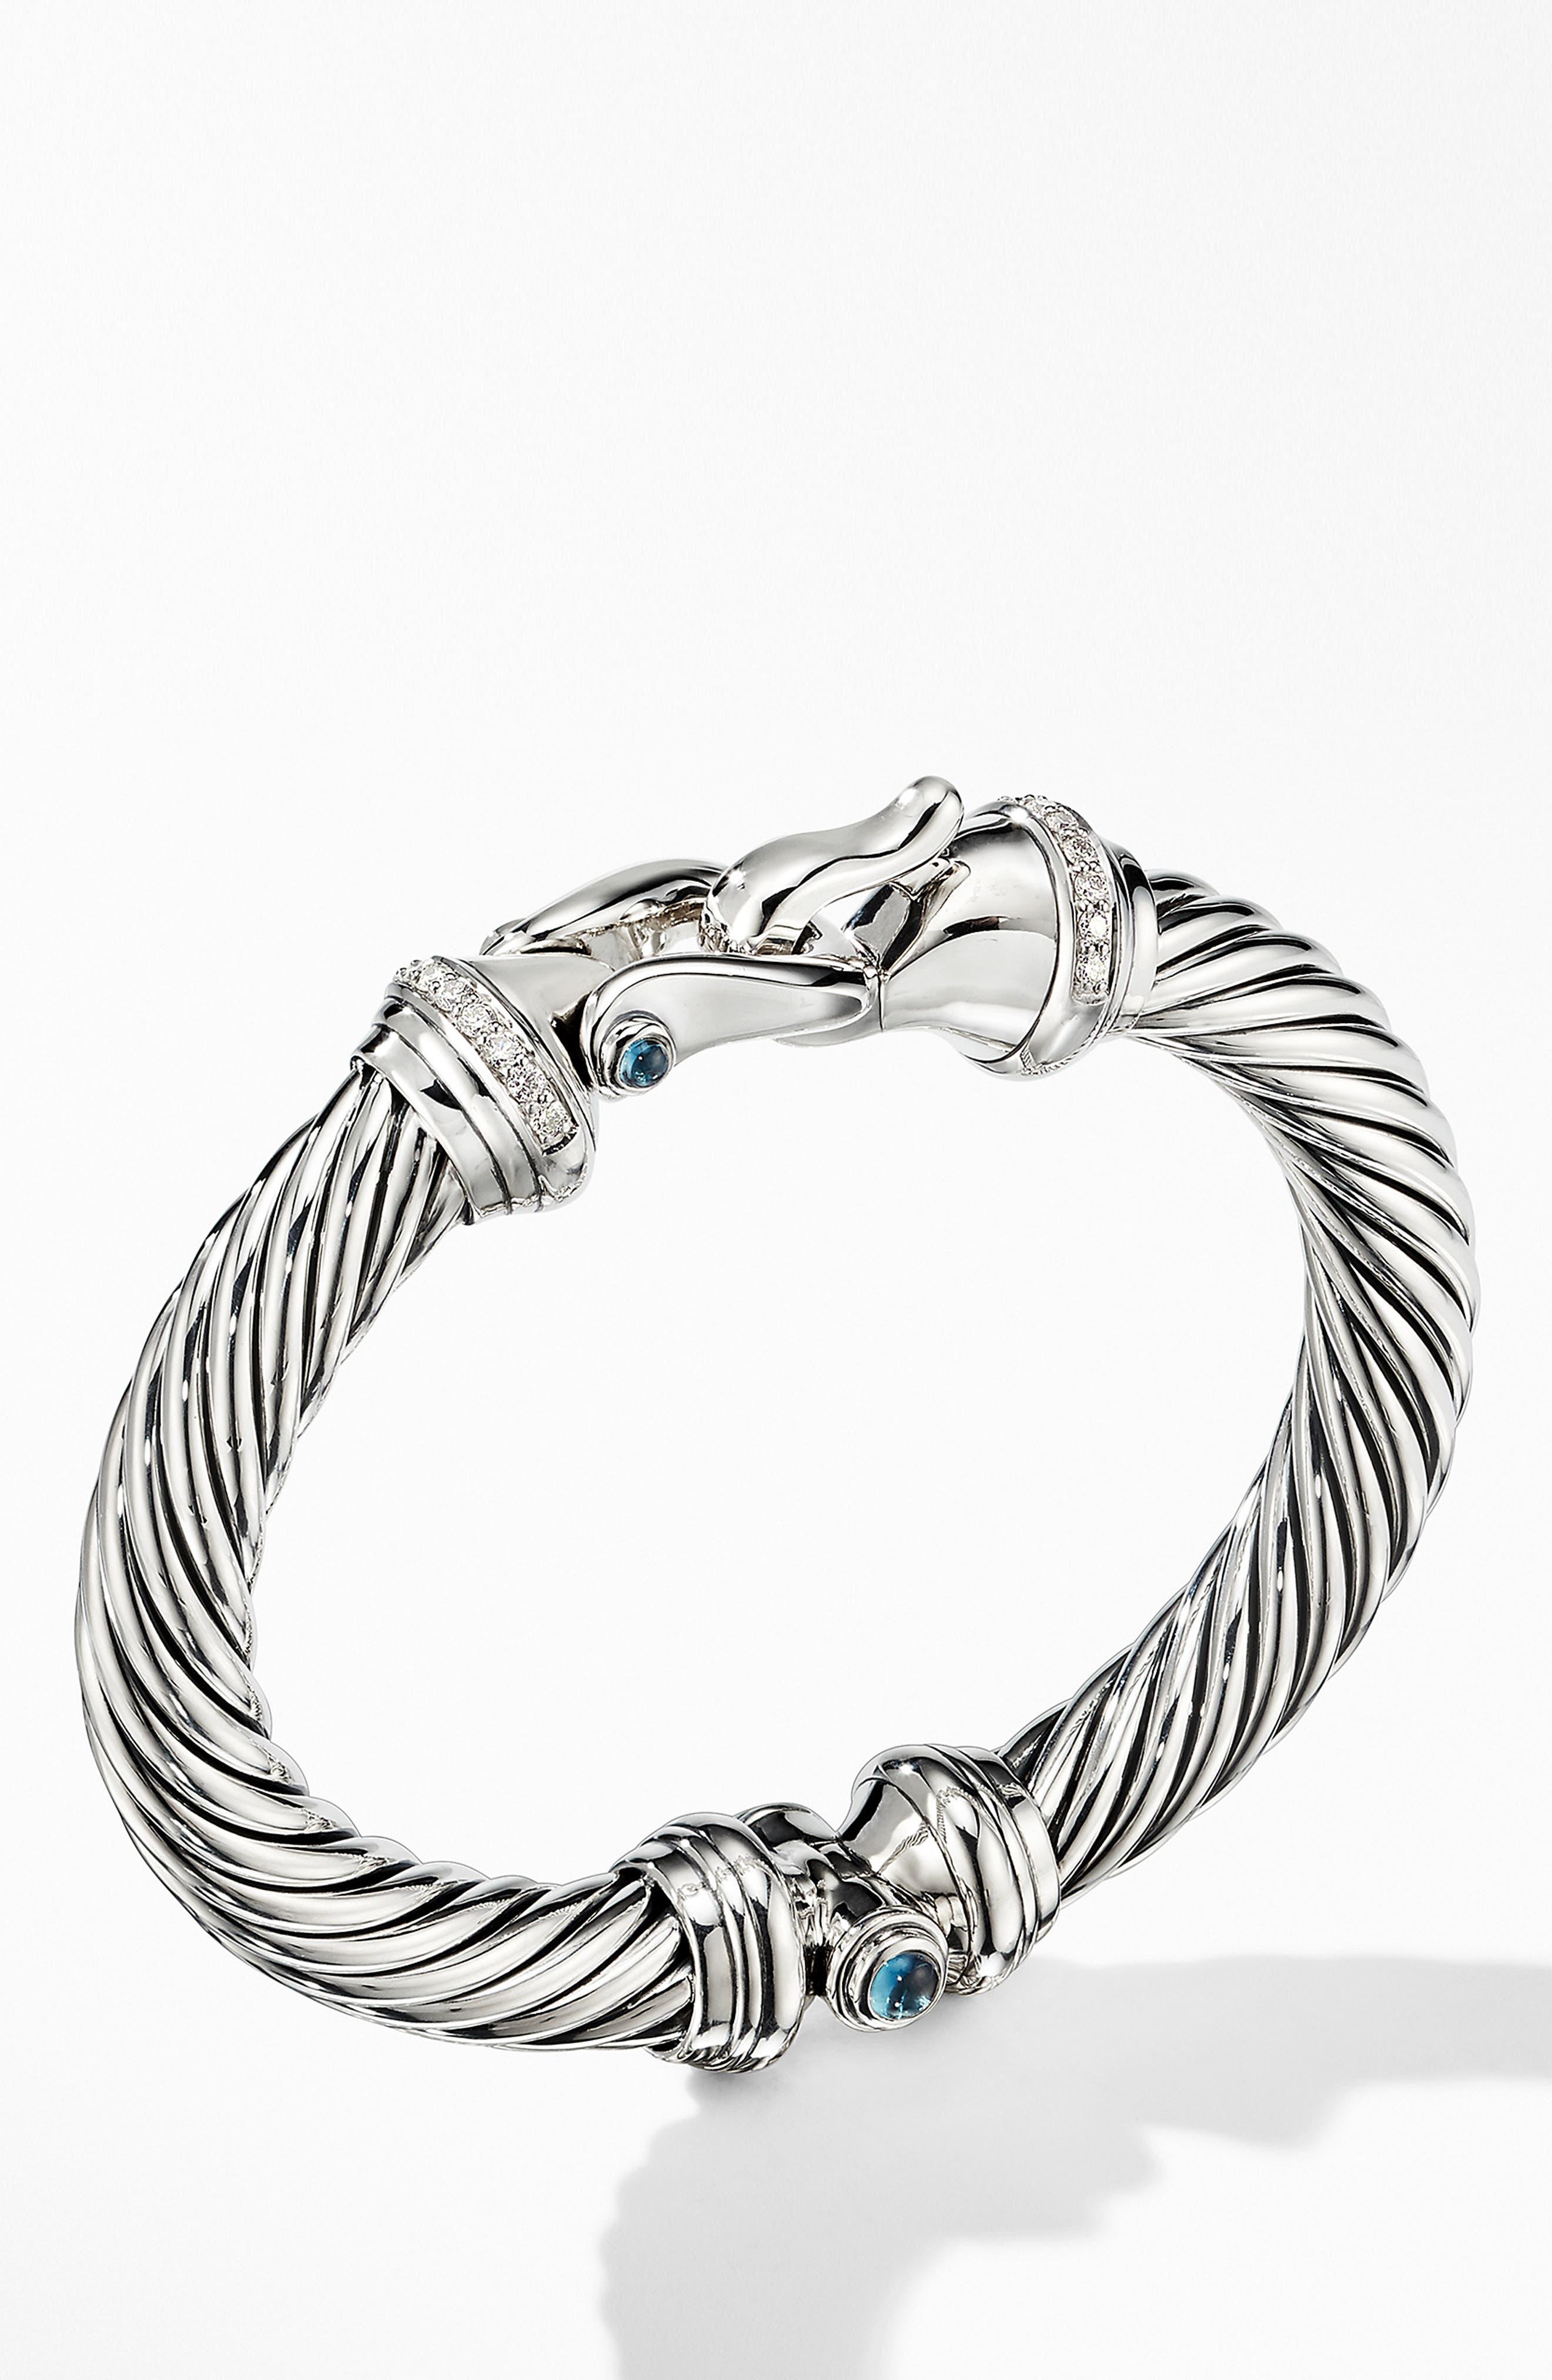 DAVID YURMAN, Cable Buckle Bracelet with Diamonds, Alternate thumbnail 2, color, HAMPTON BLUE TOPAZ